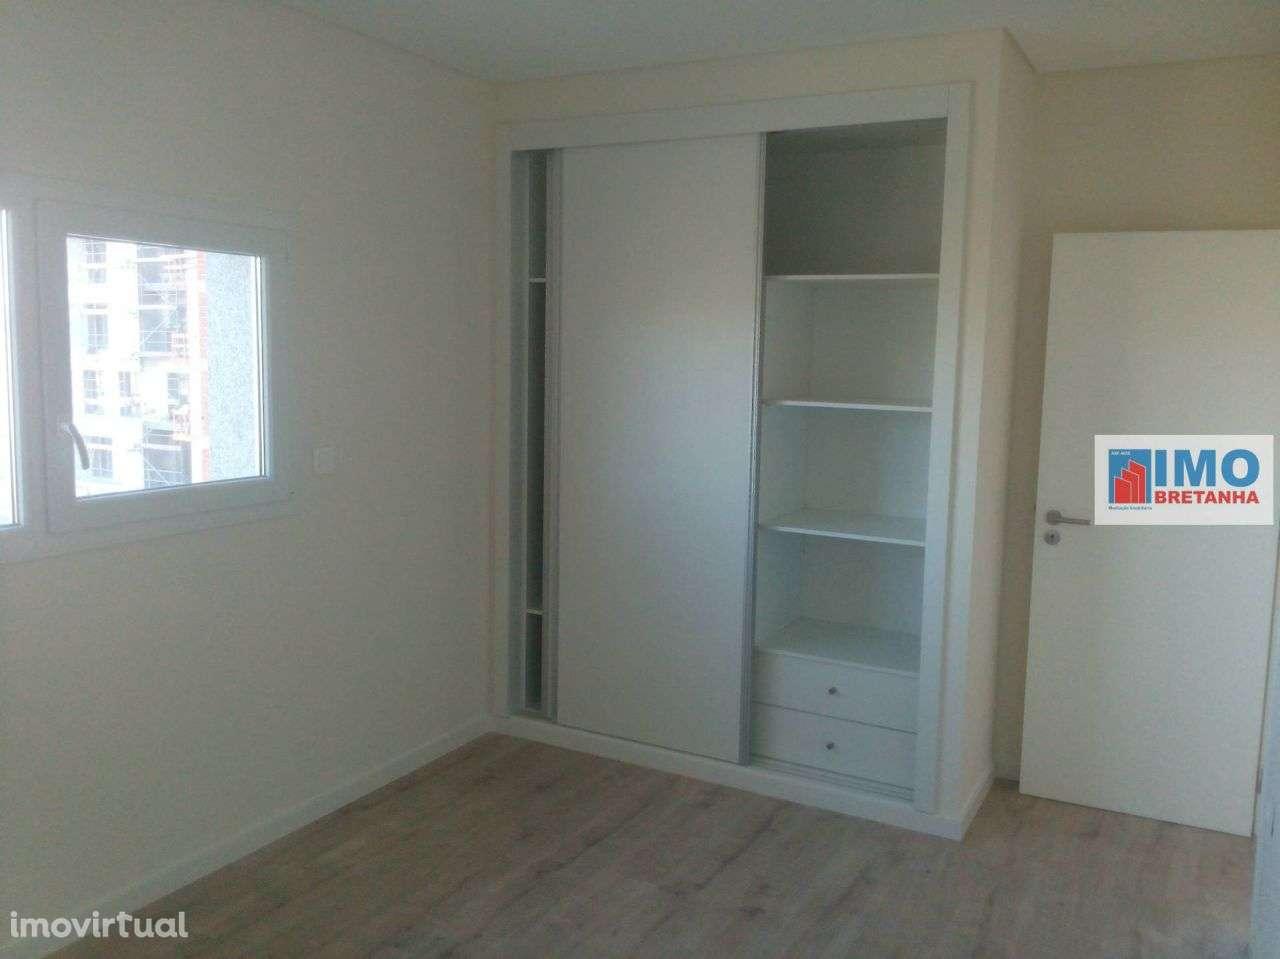 Apartamento para comprar, Covilhã e Canhoso, Covilhã, Castelo Branco - Foto 10